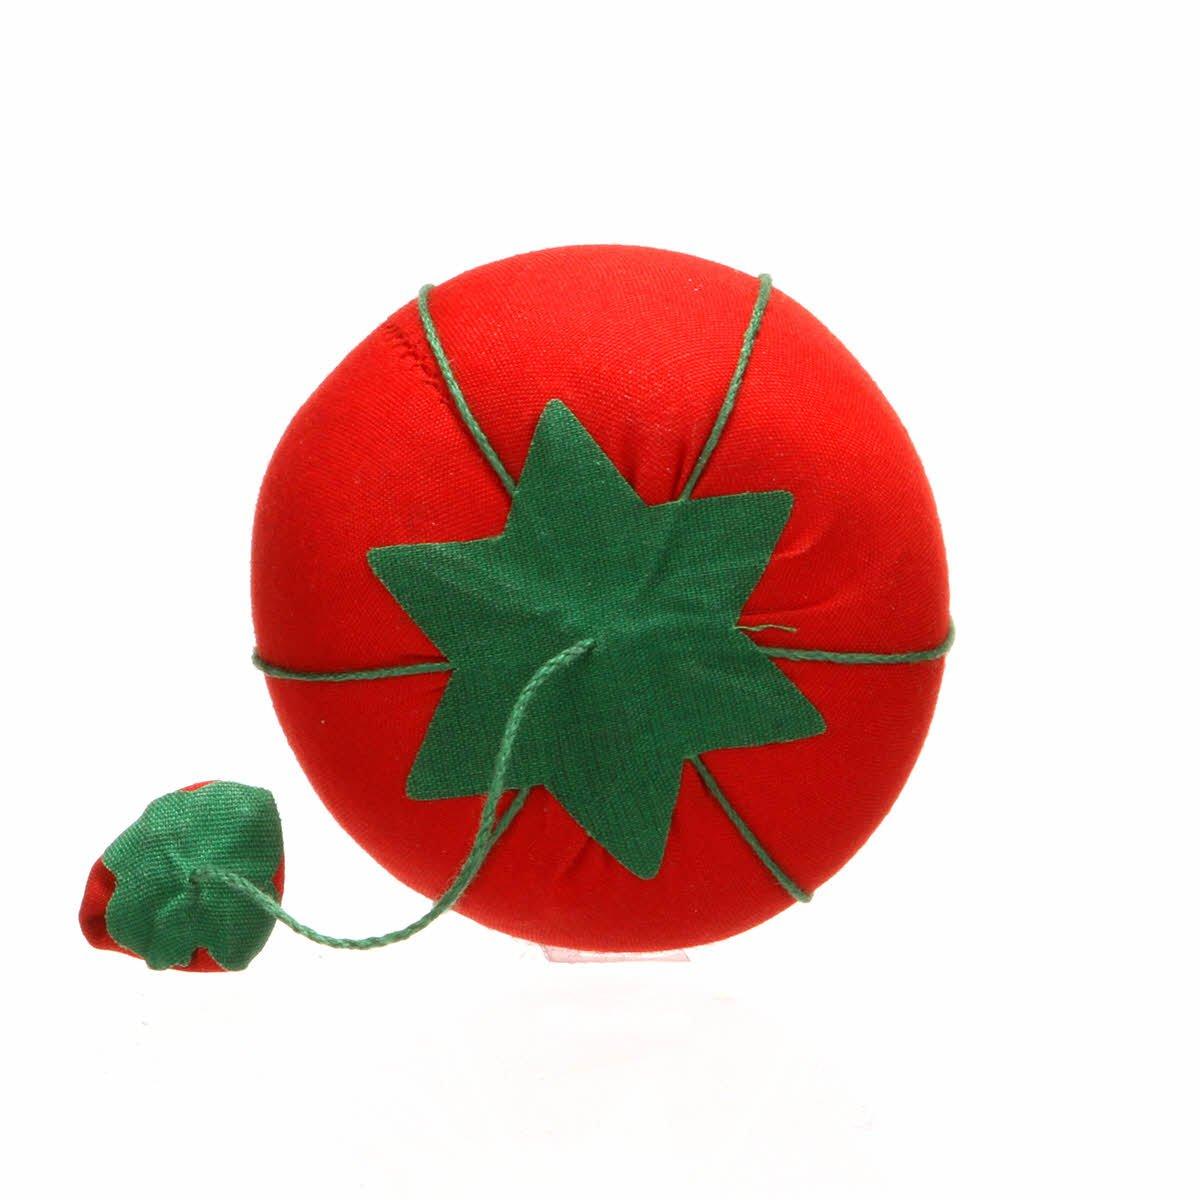 Tomato Pin Cushion w/ Emery